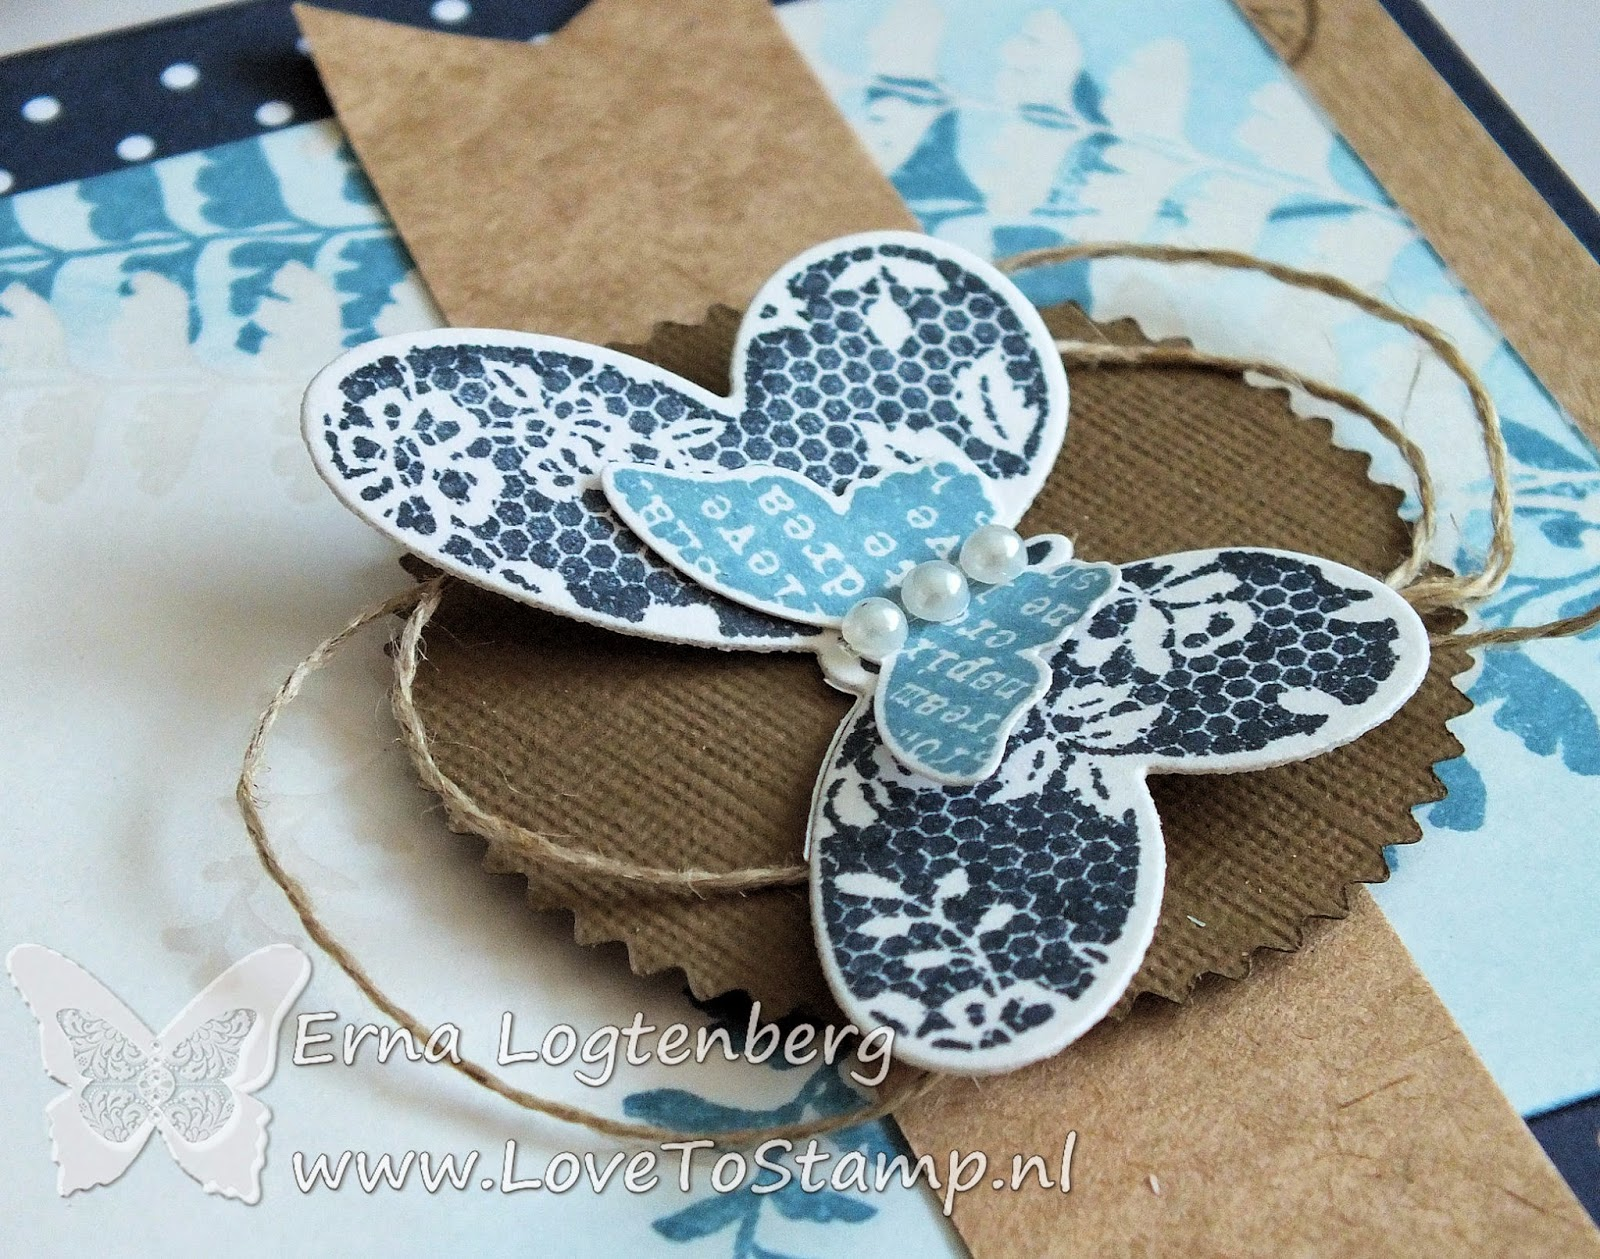 stampin up Stampin'Up! Butterfly Basics Erna Logtenberg